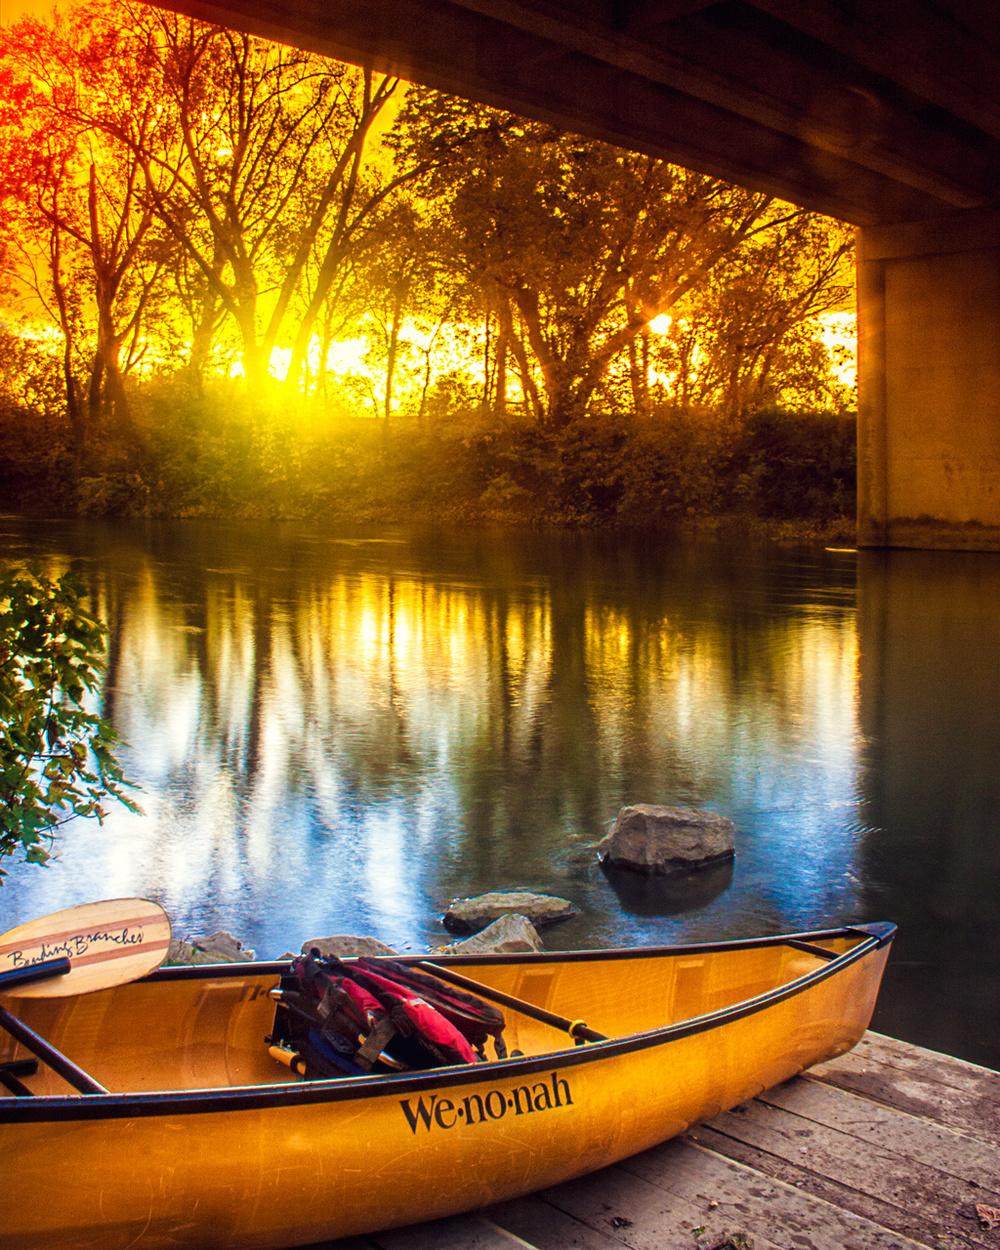 Outdoor Scenic - Canoe